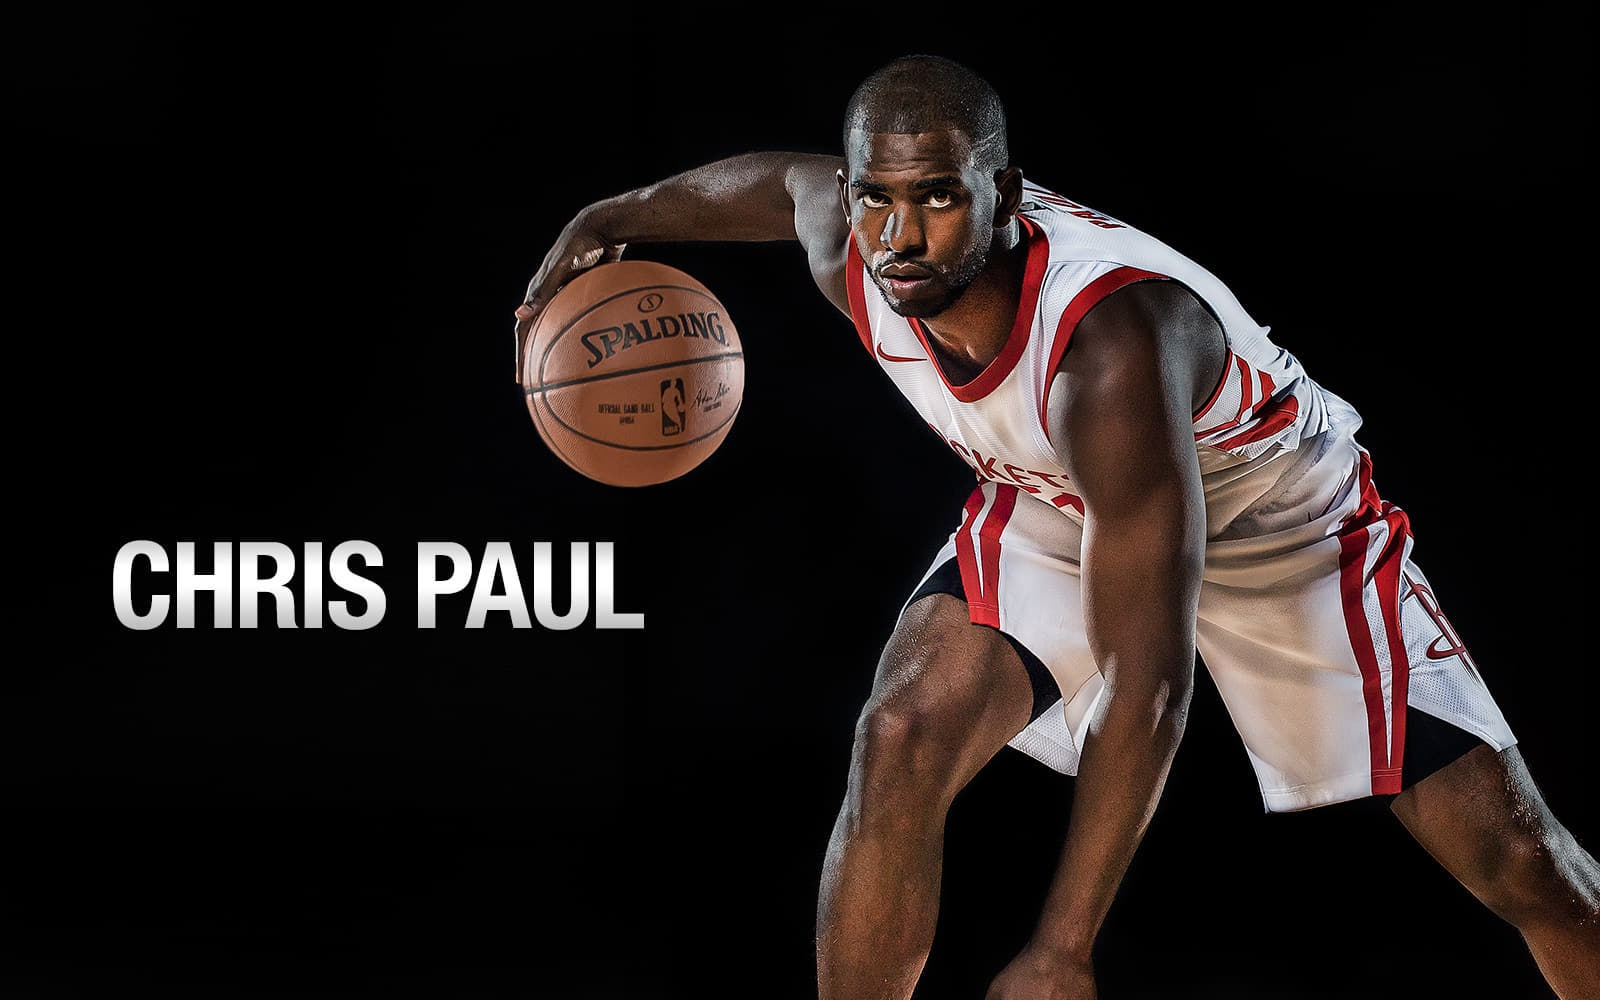 ポール クリス